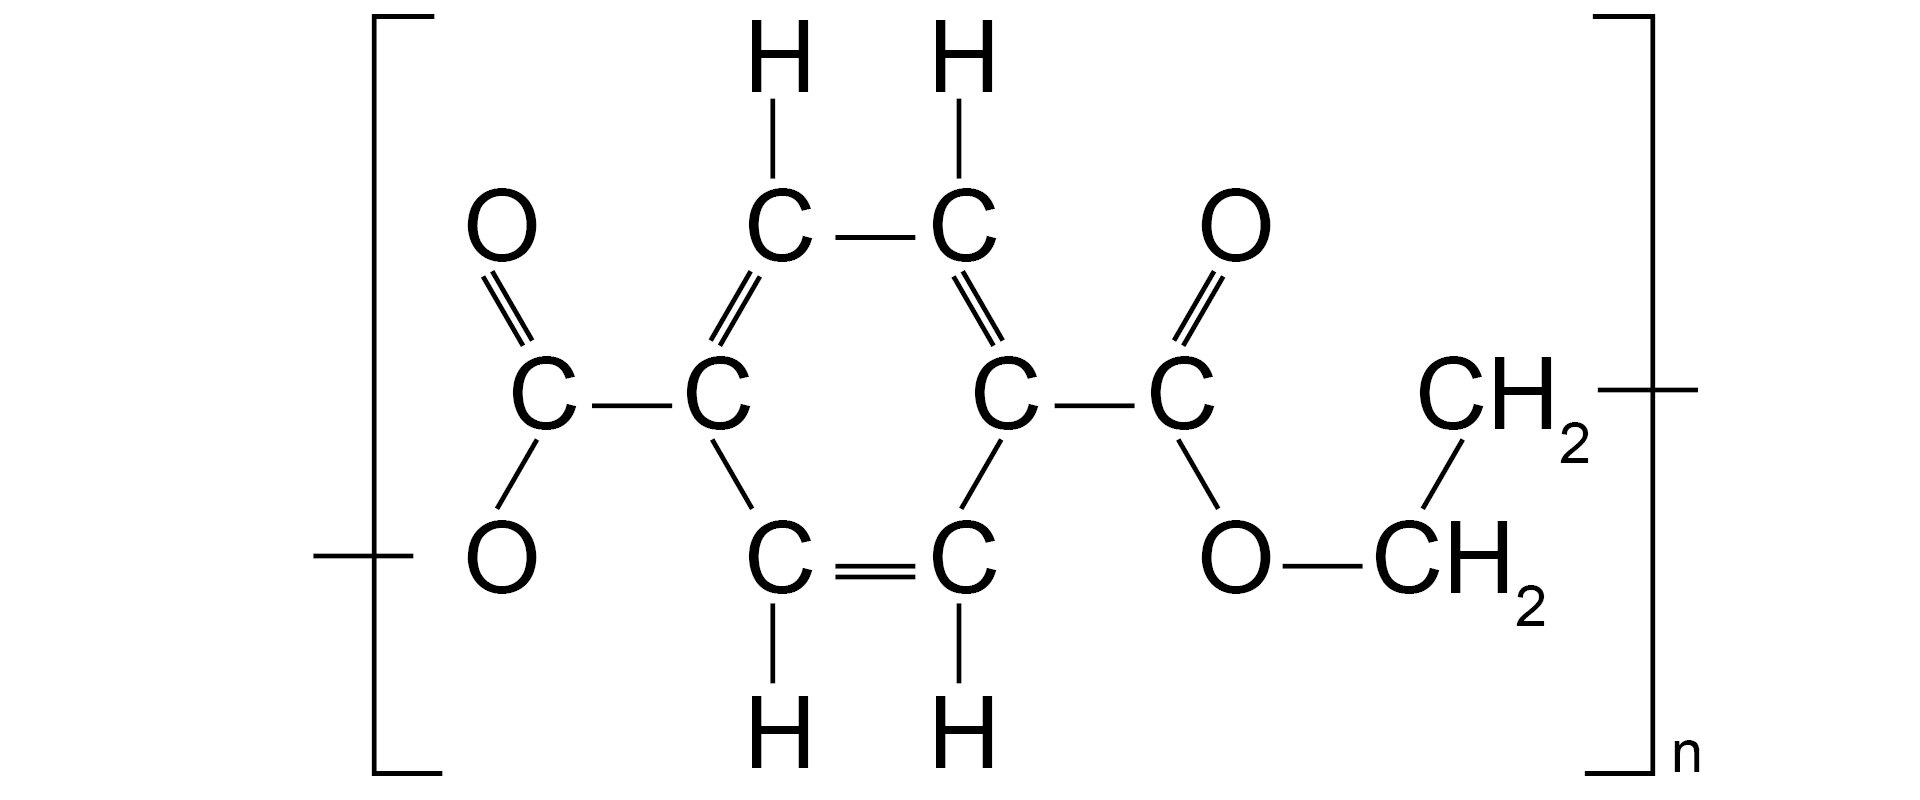 Ilustracja pokazuje wzór strukturalny politereftalanu etylenu.